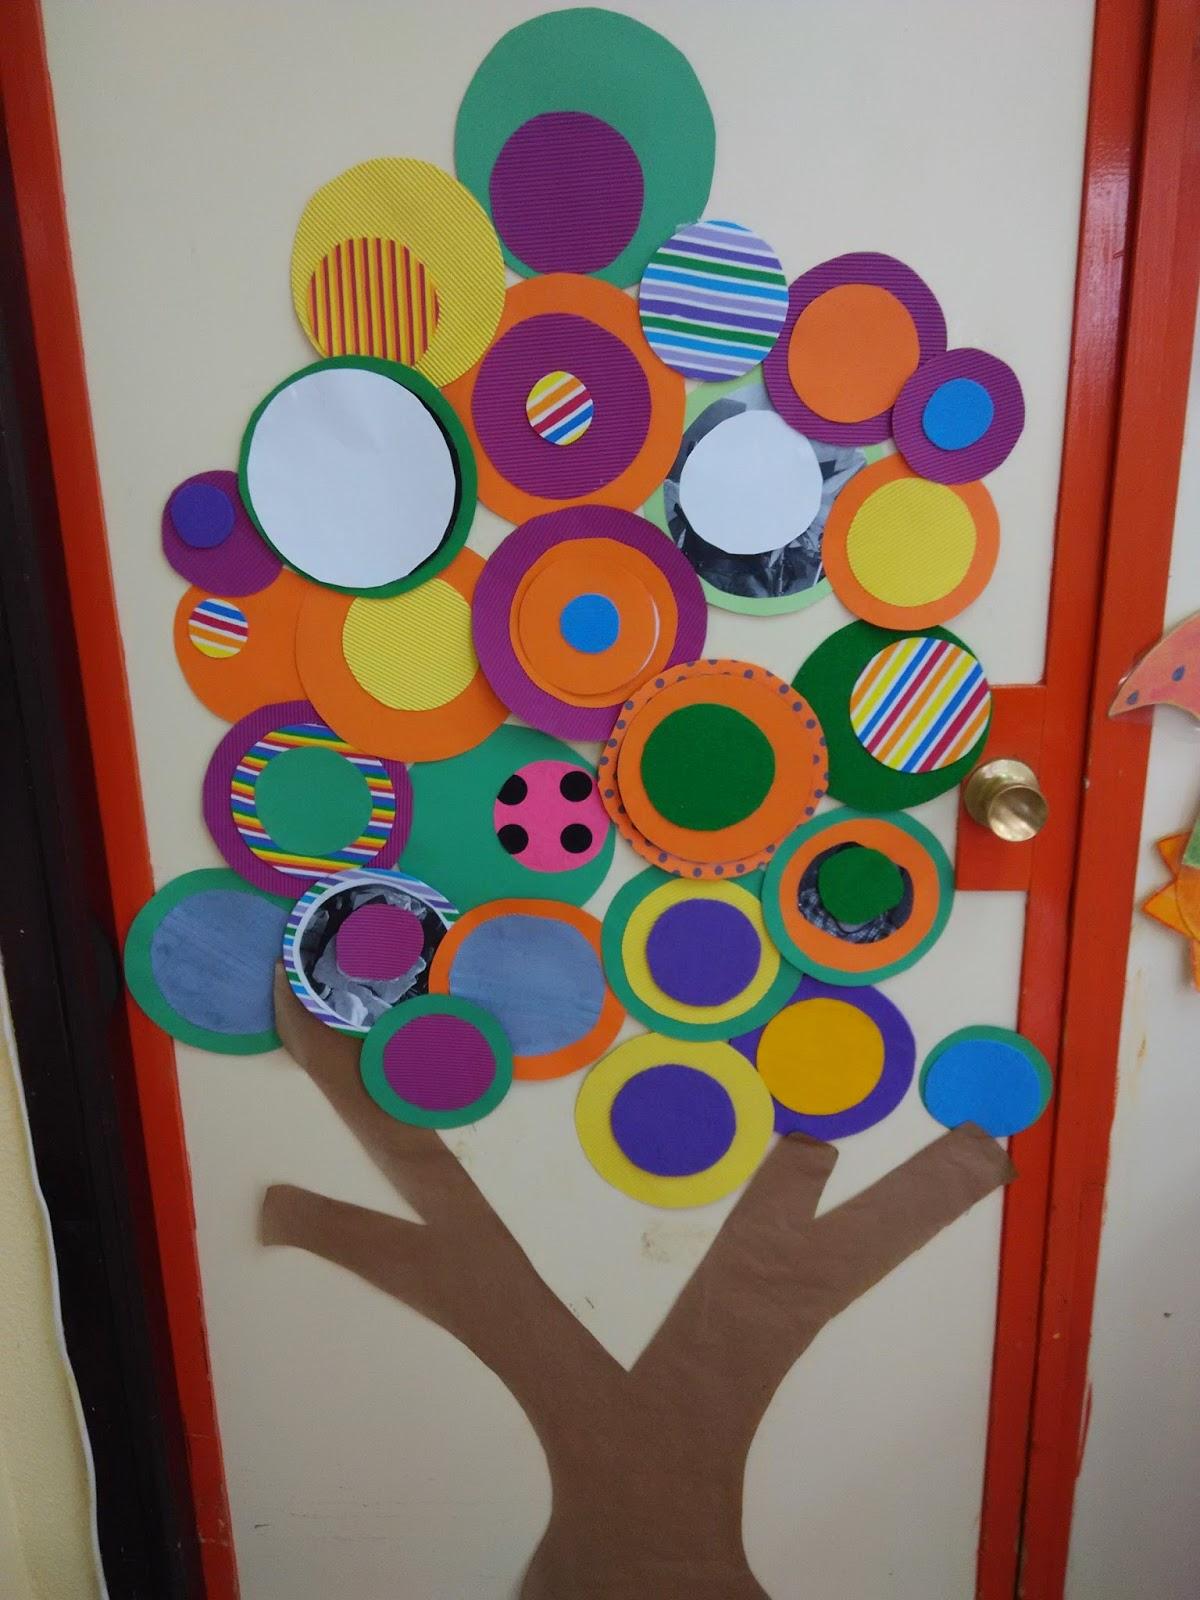 El blog de mi aula marzo 2015 for Decoracion puerta aula infantil